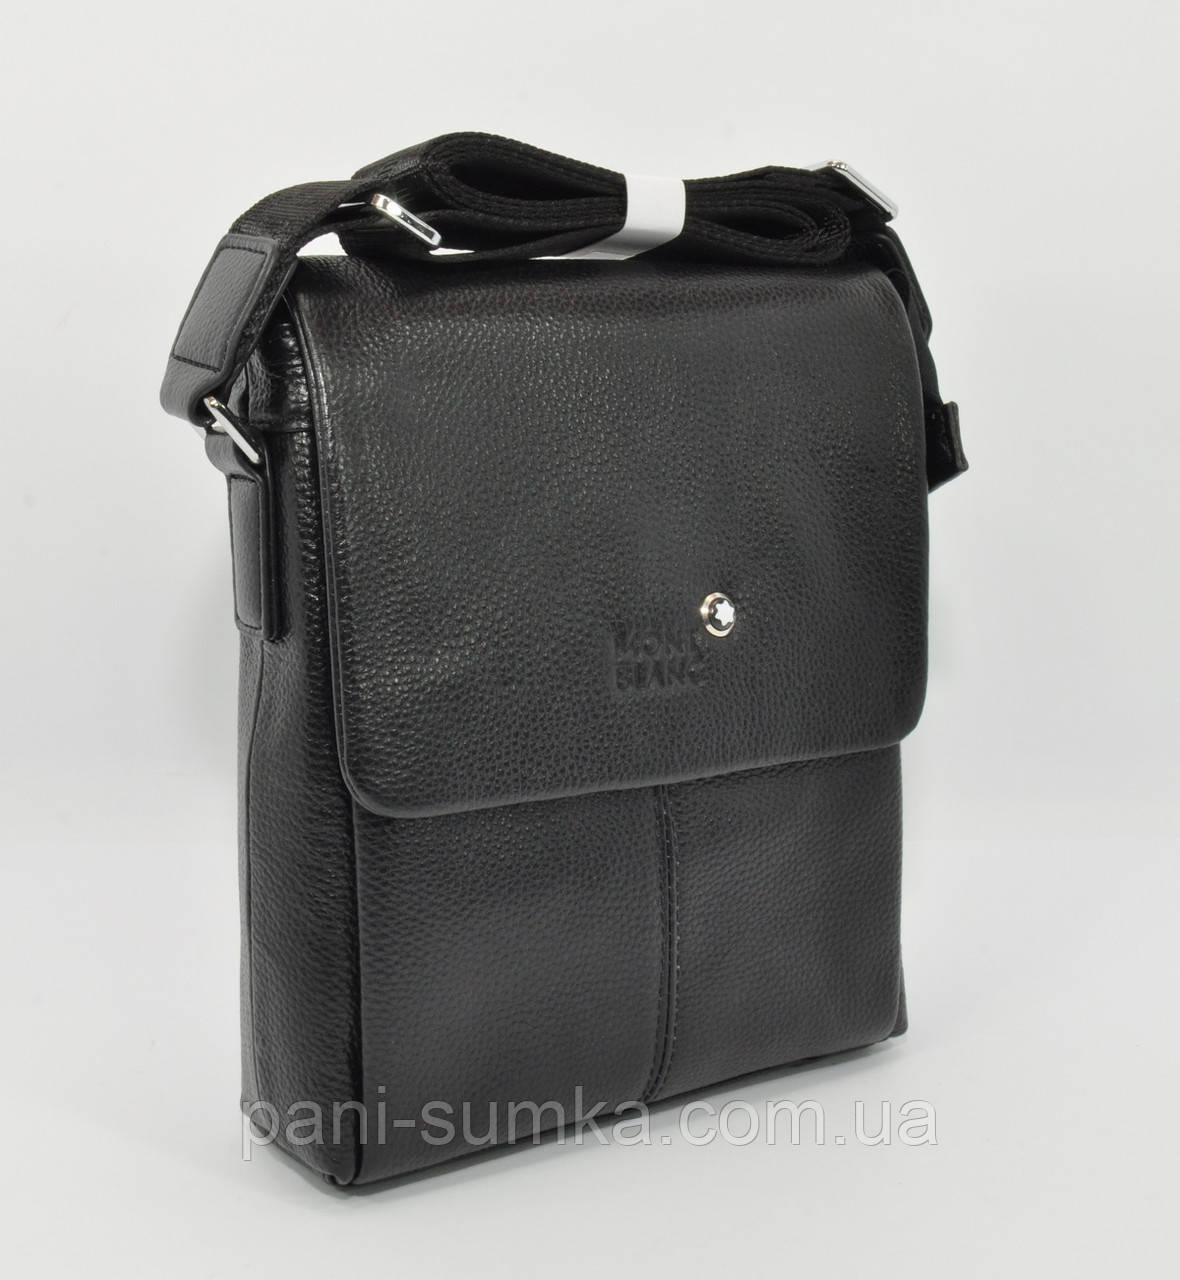 5933eb6a4646 Мужская кожаная сумка Montblanc 9068-2 черная средняя: продажа, цена ...